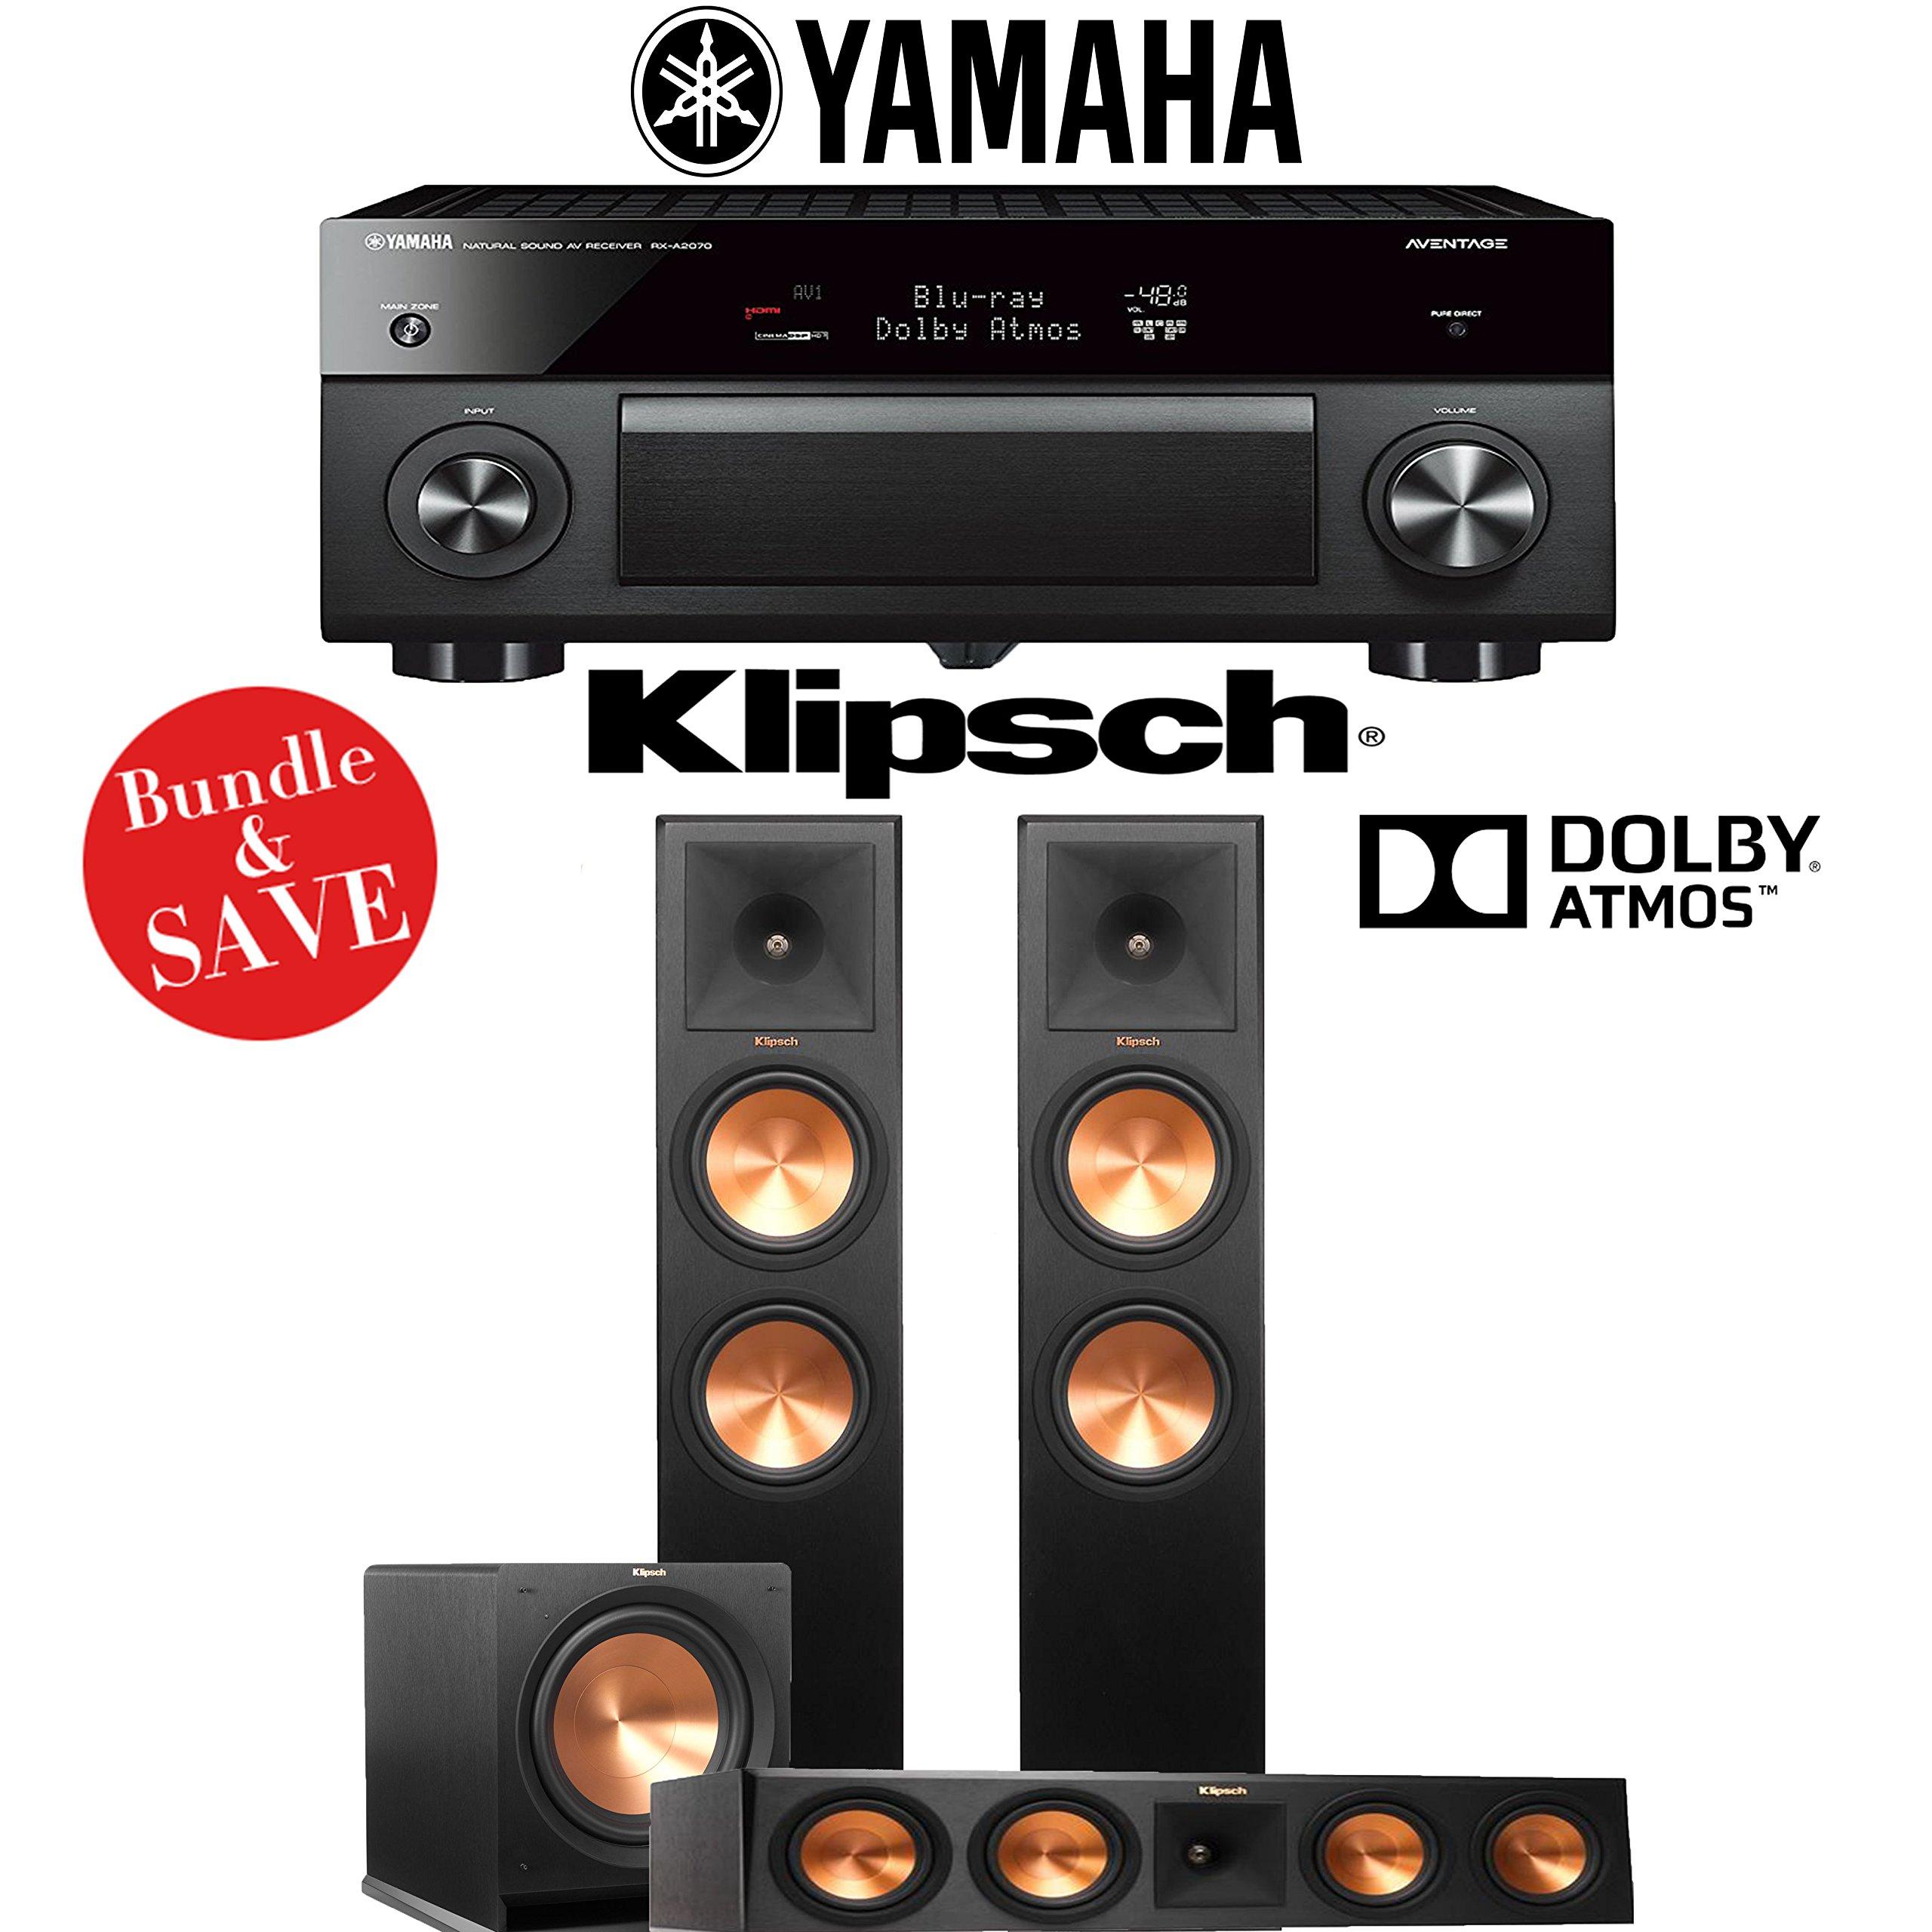 Yamaha AVENTAGE RX-A2070BL 9.2-Ch 4K Network AV Receiver + Klipsch RP-280FA + Klipsch RP-450C + Klipsch R-112SW - 3.1-Ch Dolby Atmos Home Theater Package by Klipsch